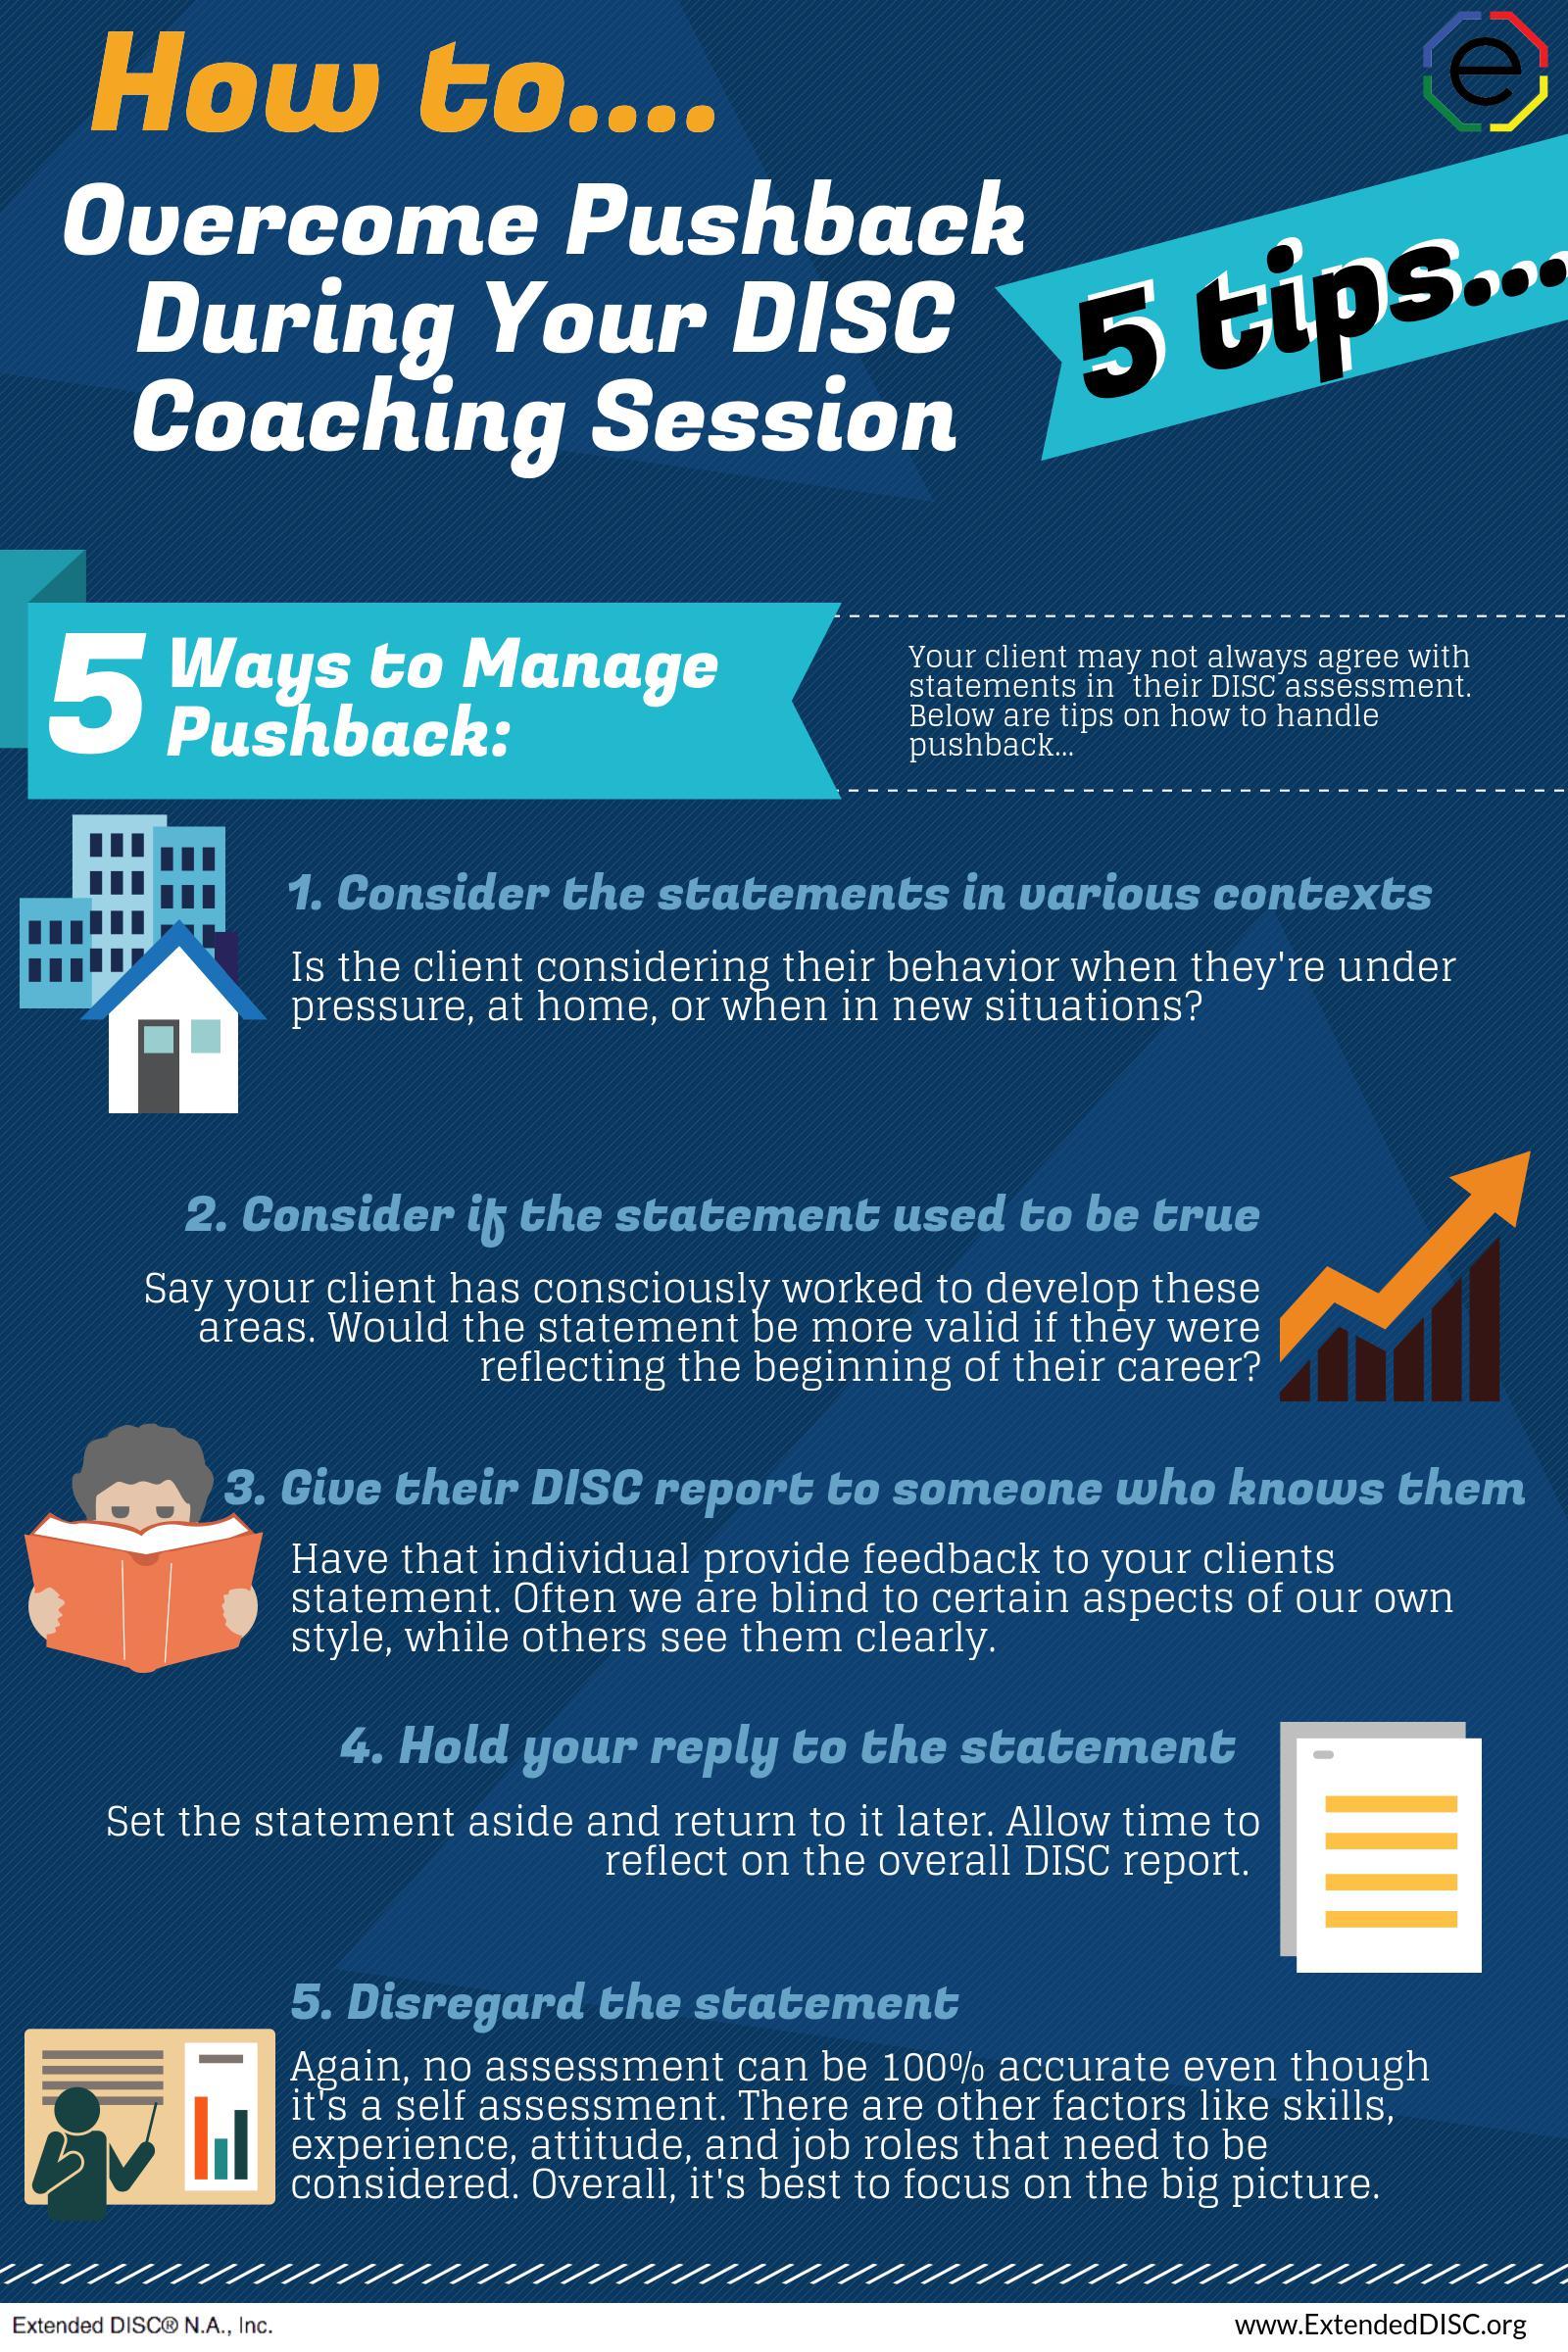 DISC Coaching Overcoming Pushback